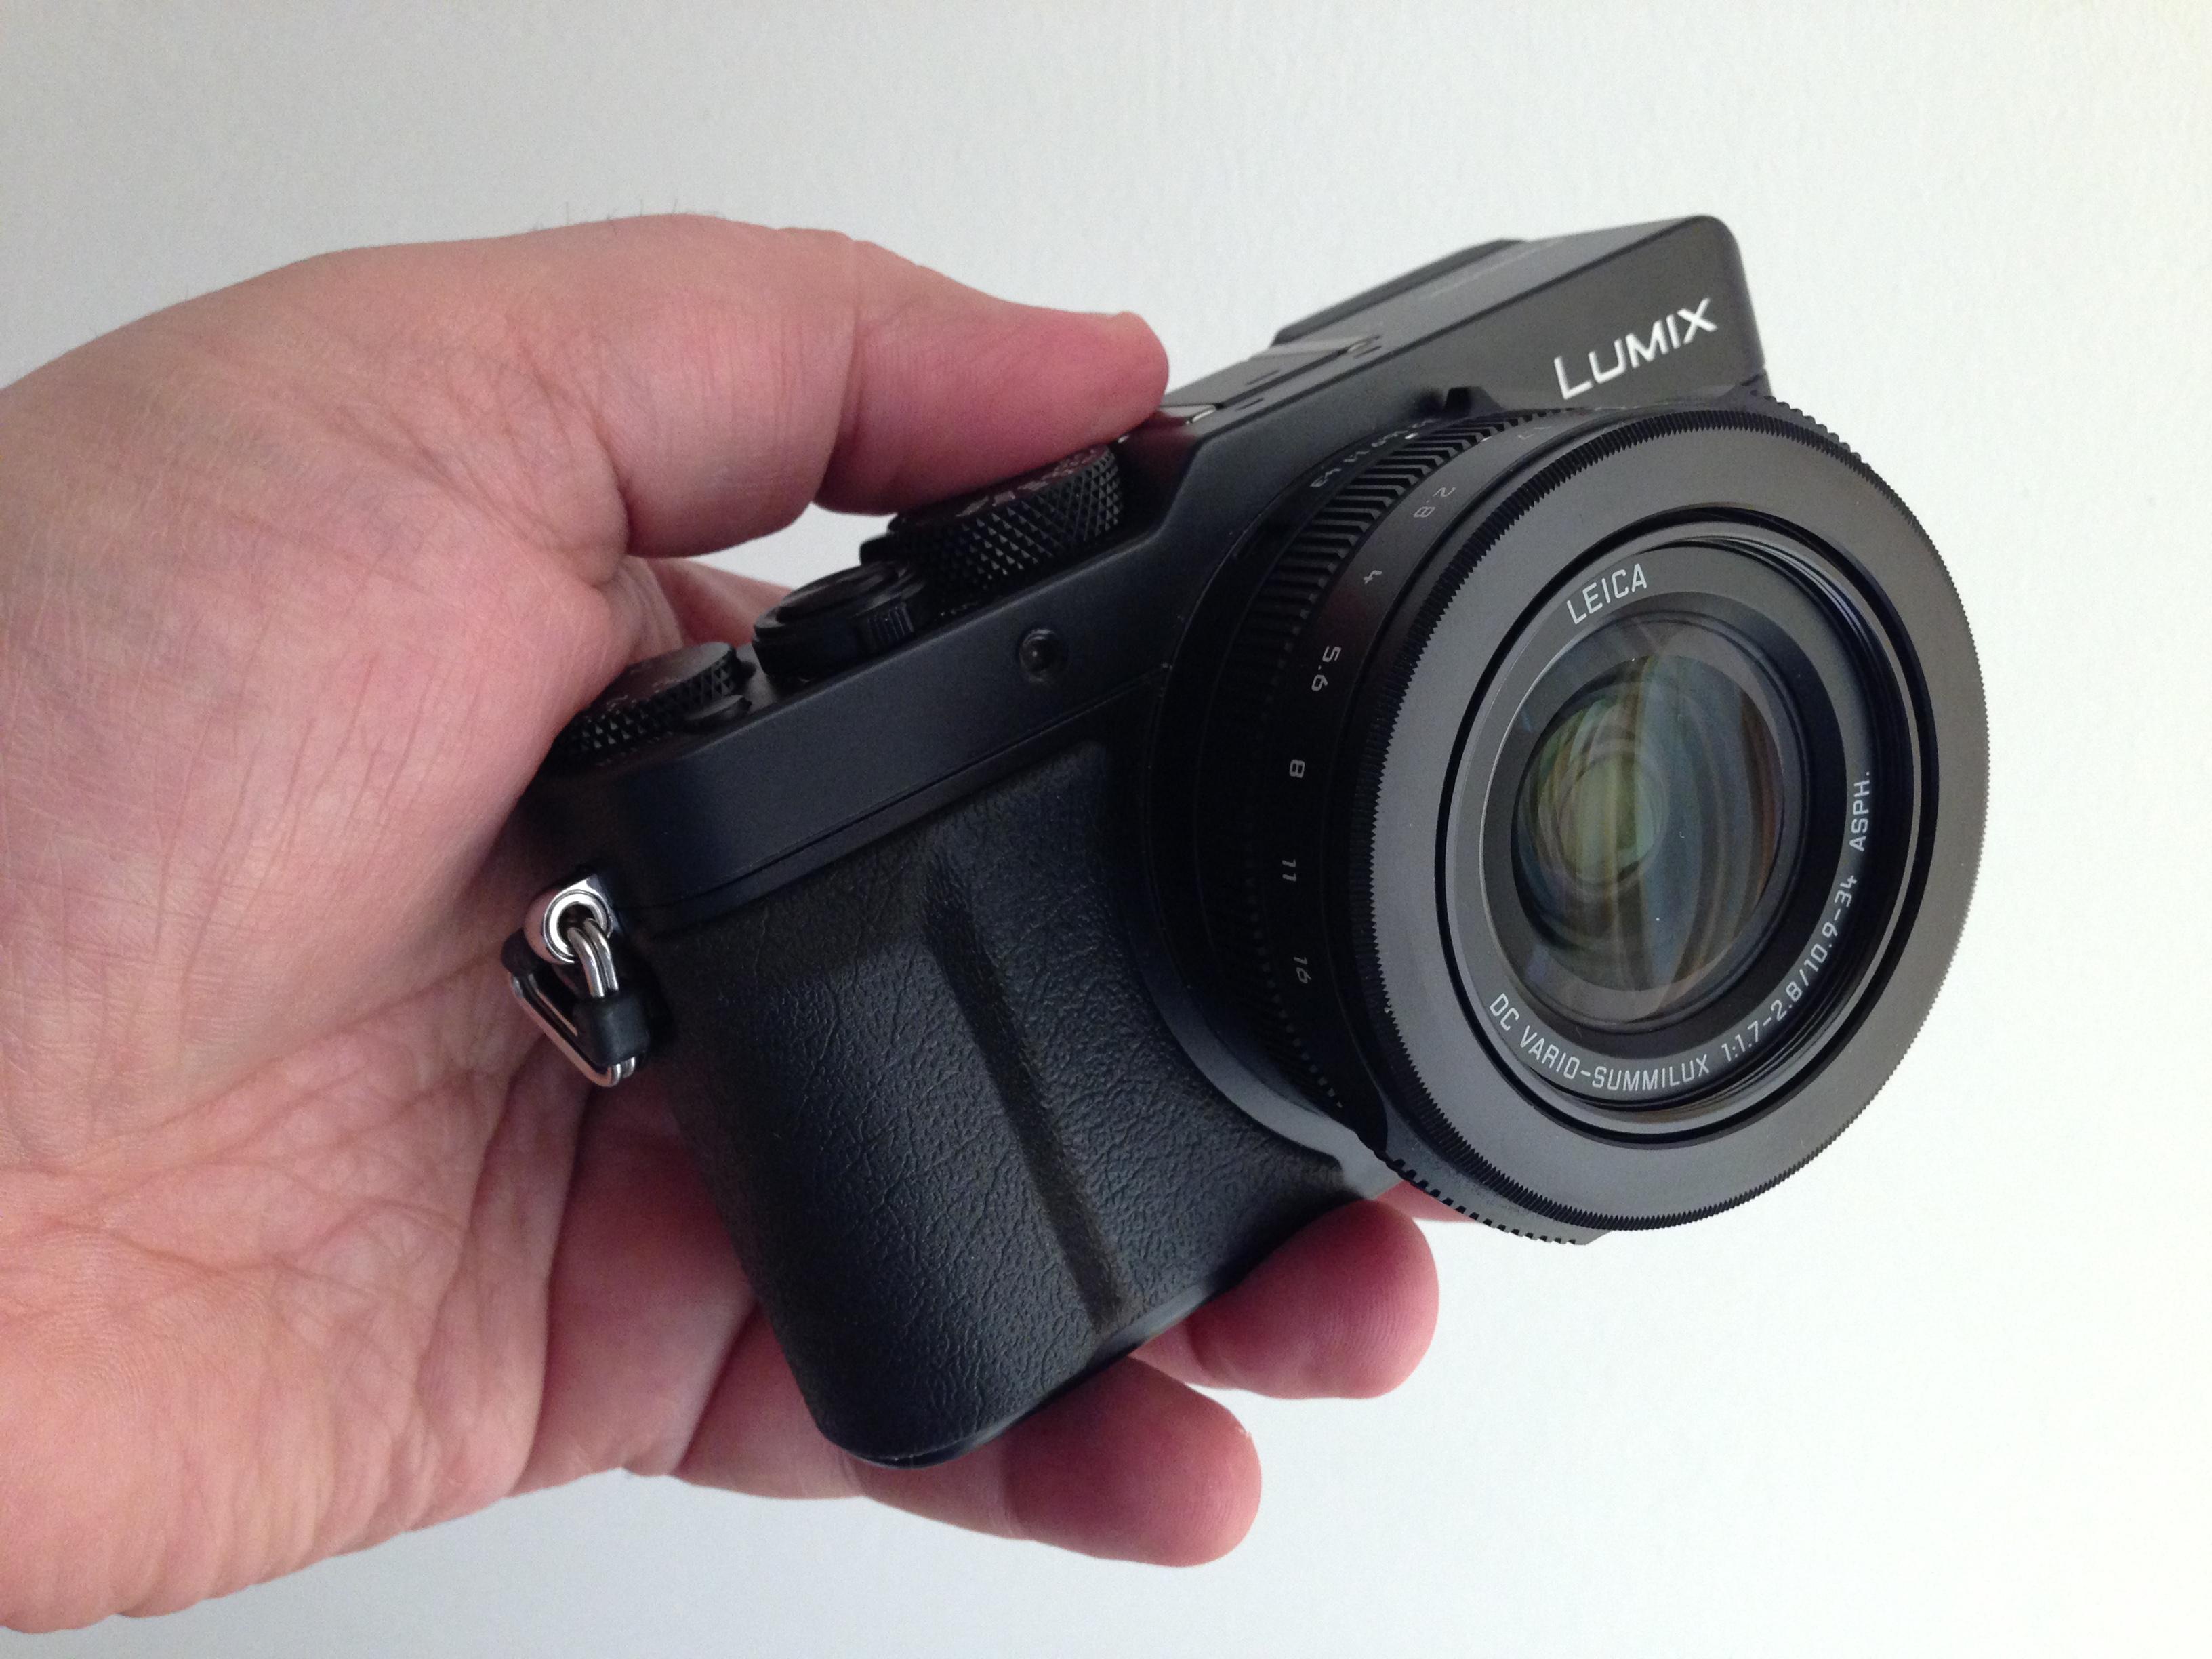 Die Panasonic Lumix DMC-LX100 gilt als beste Kompaktkamera bisher